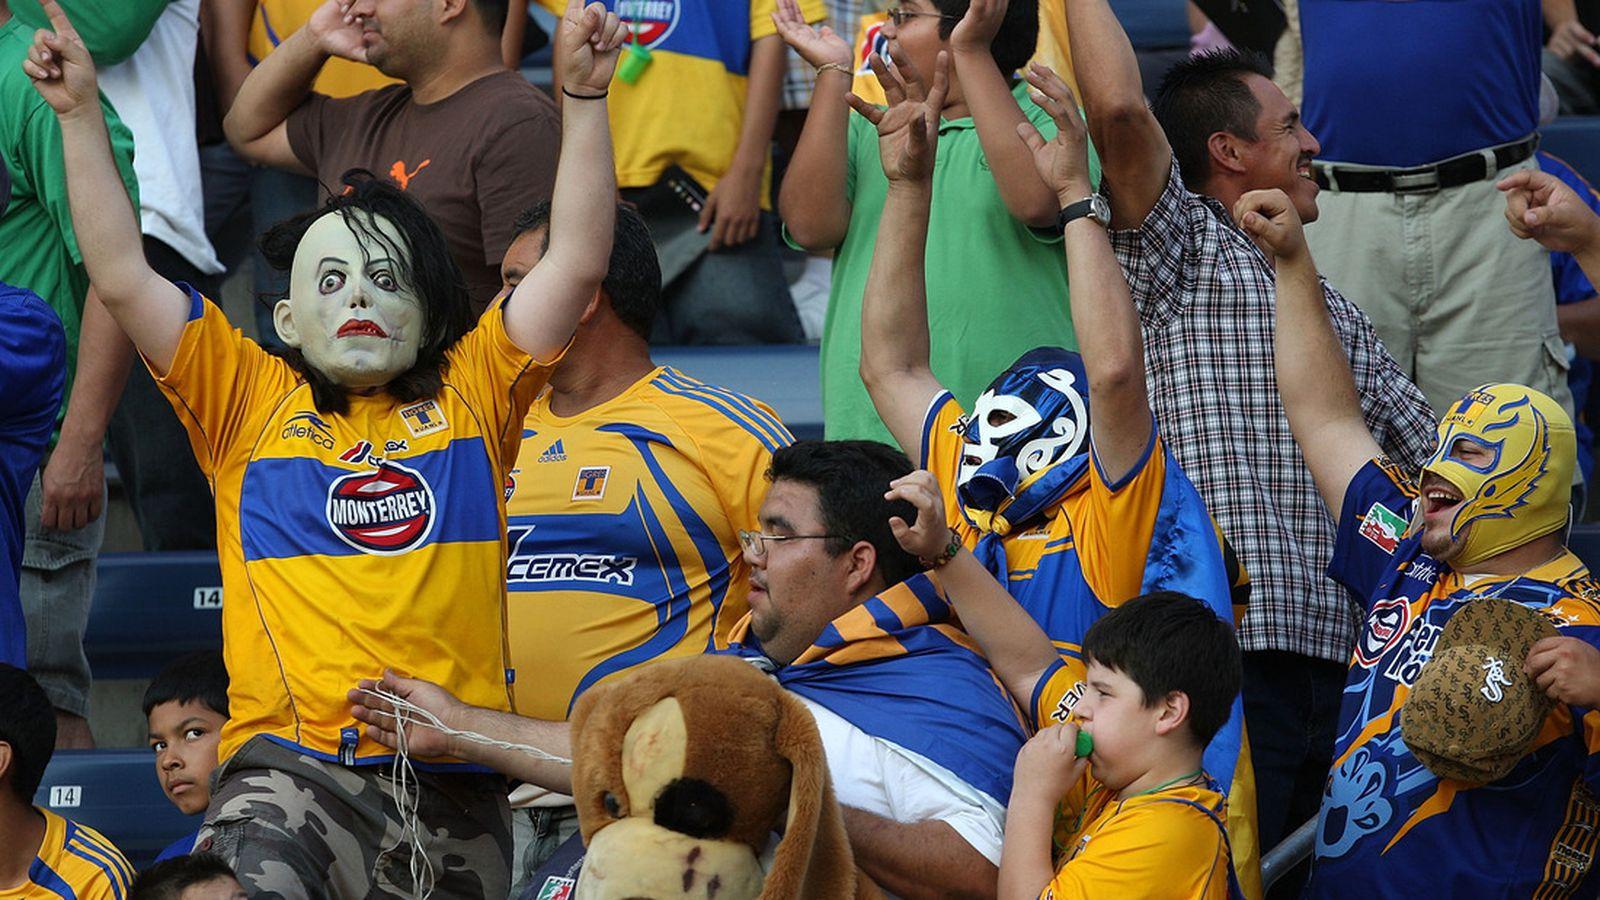 Santos Laguna Vs. UANL Tigres, 2011 Apertura Liguilla Final: Tigres Defeat Ten-Man Santos 1-0 ...